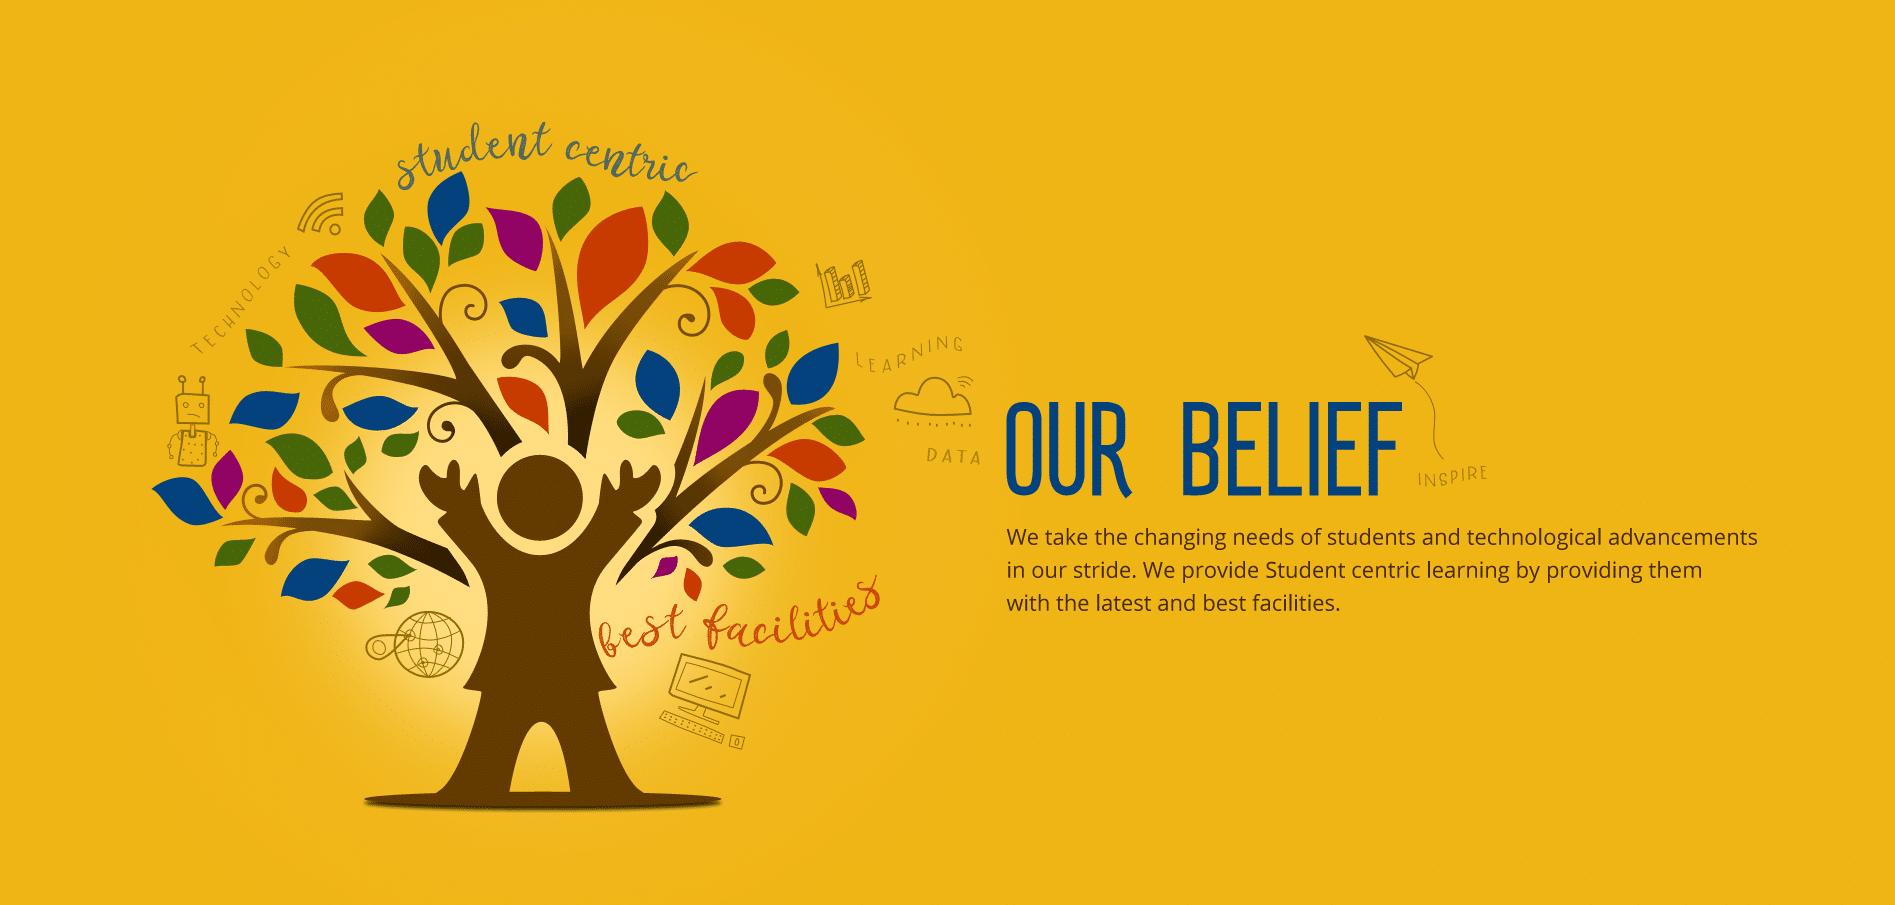 KGI Belief